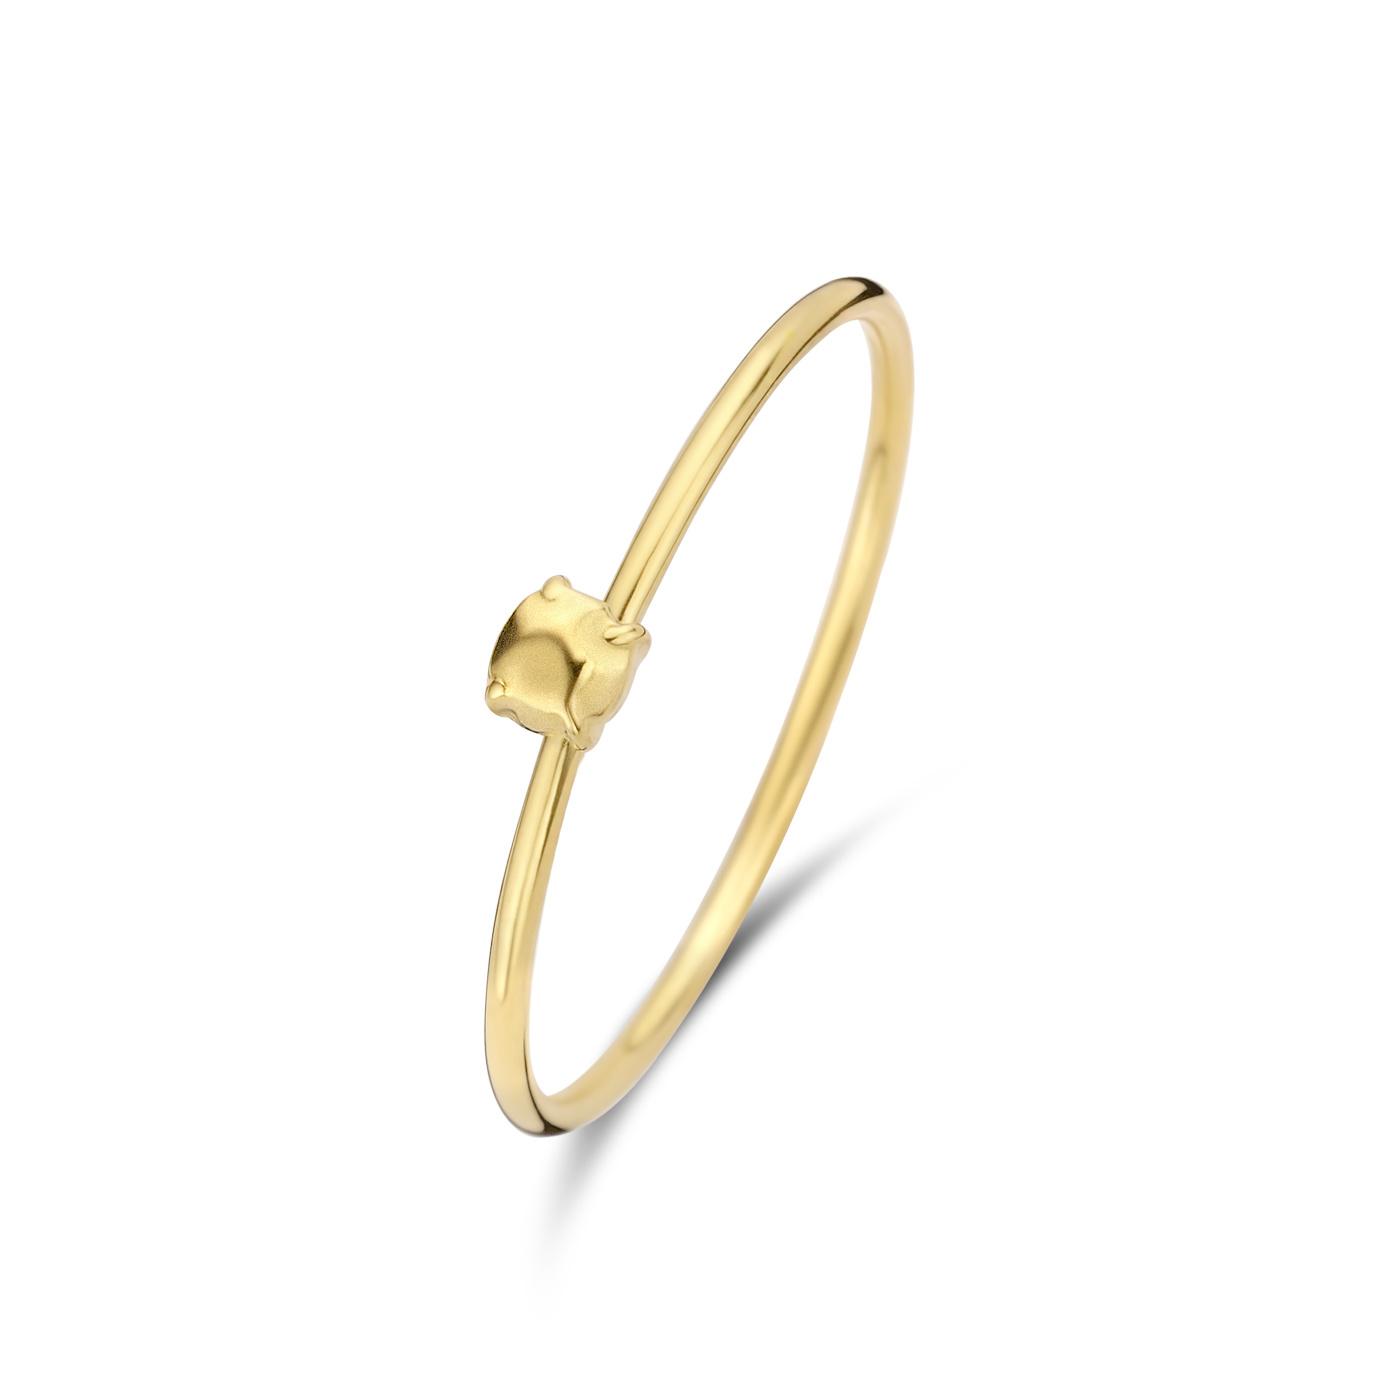 Violet Hamden Sisterhood Stone 925 Sterling Silber goldfarbener Ring mit Stein